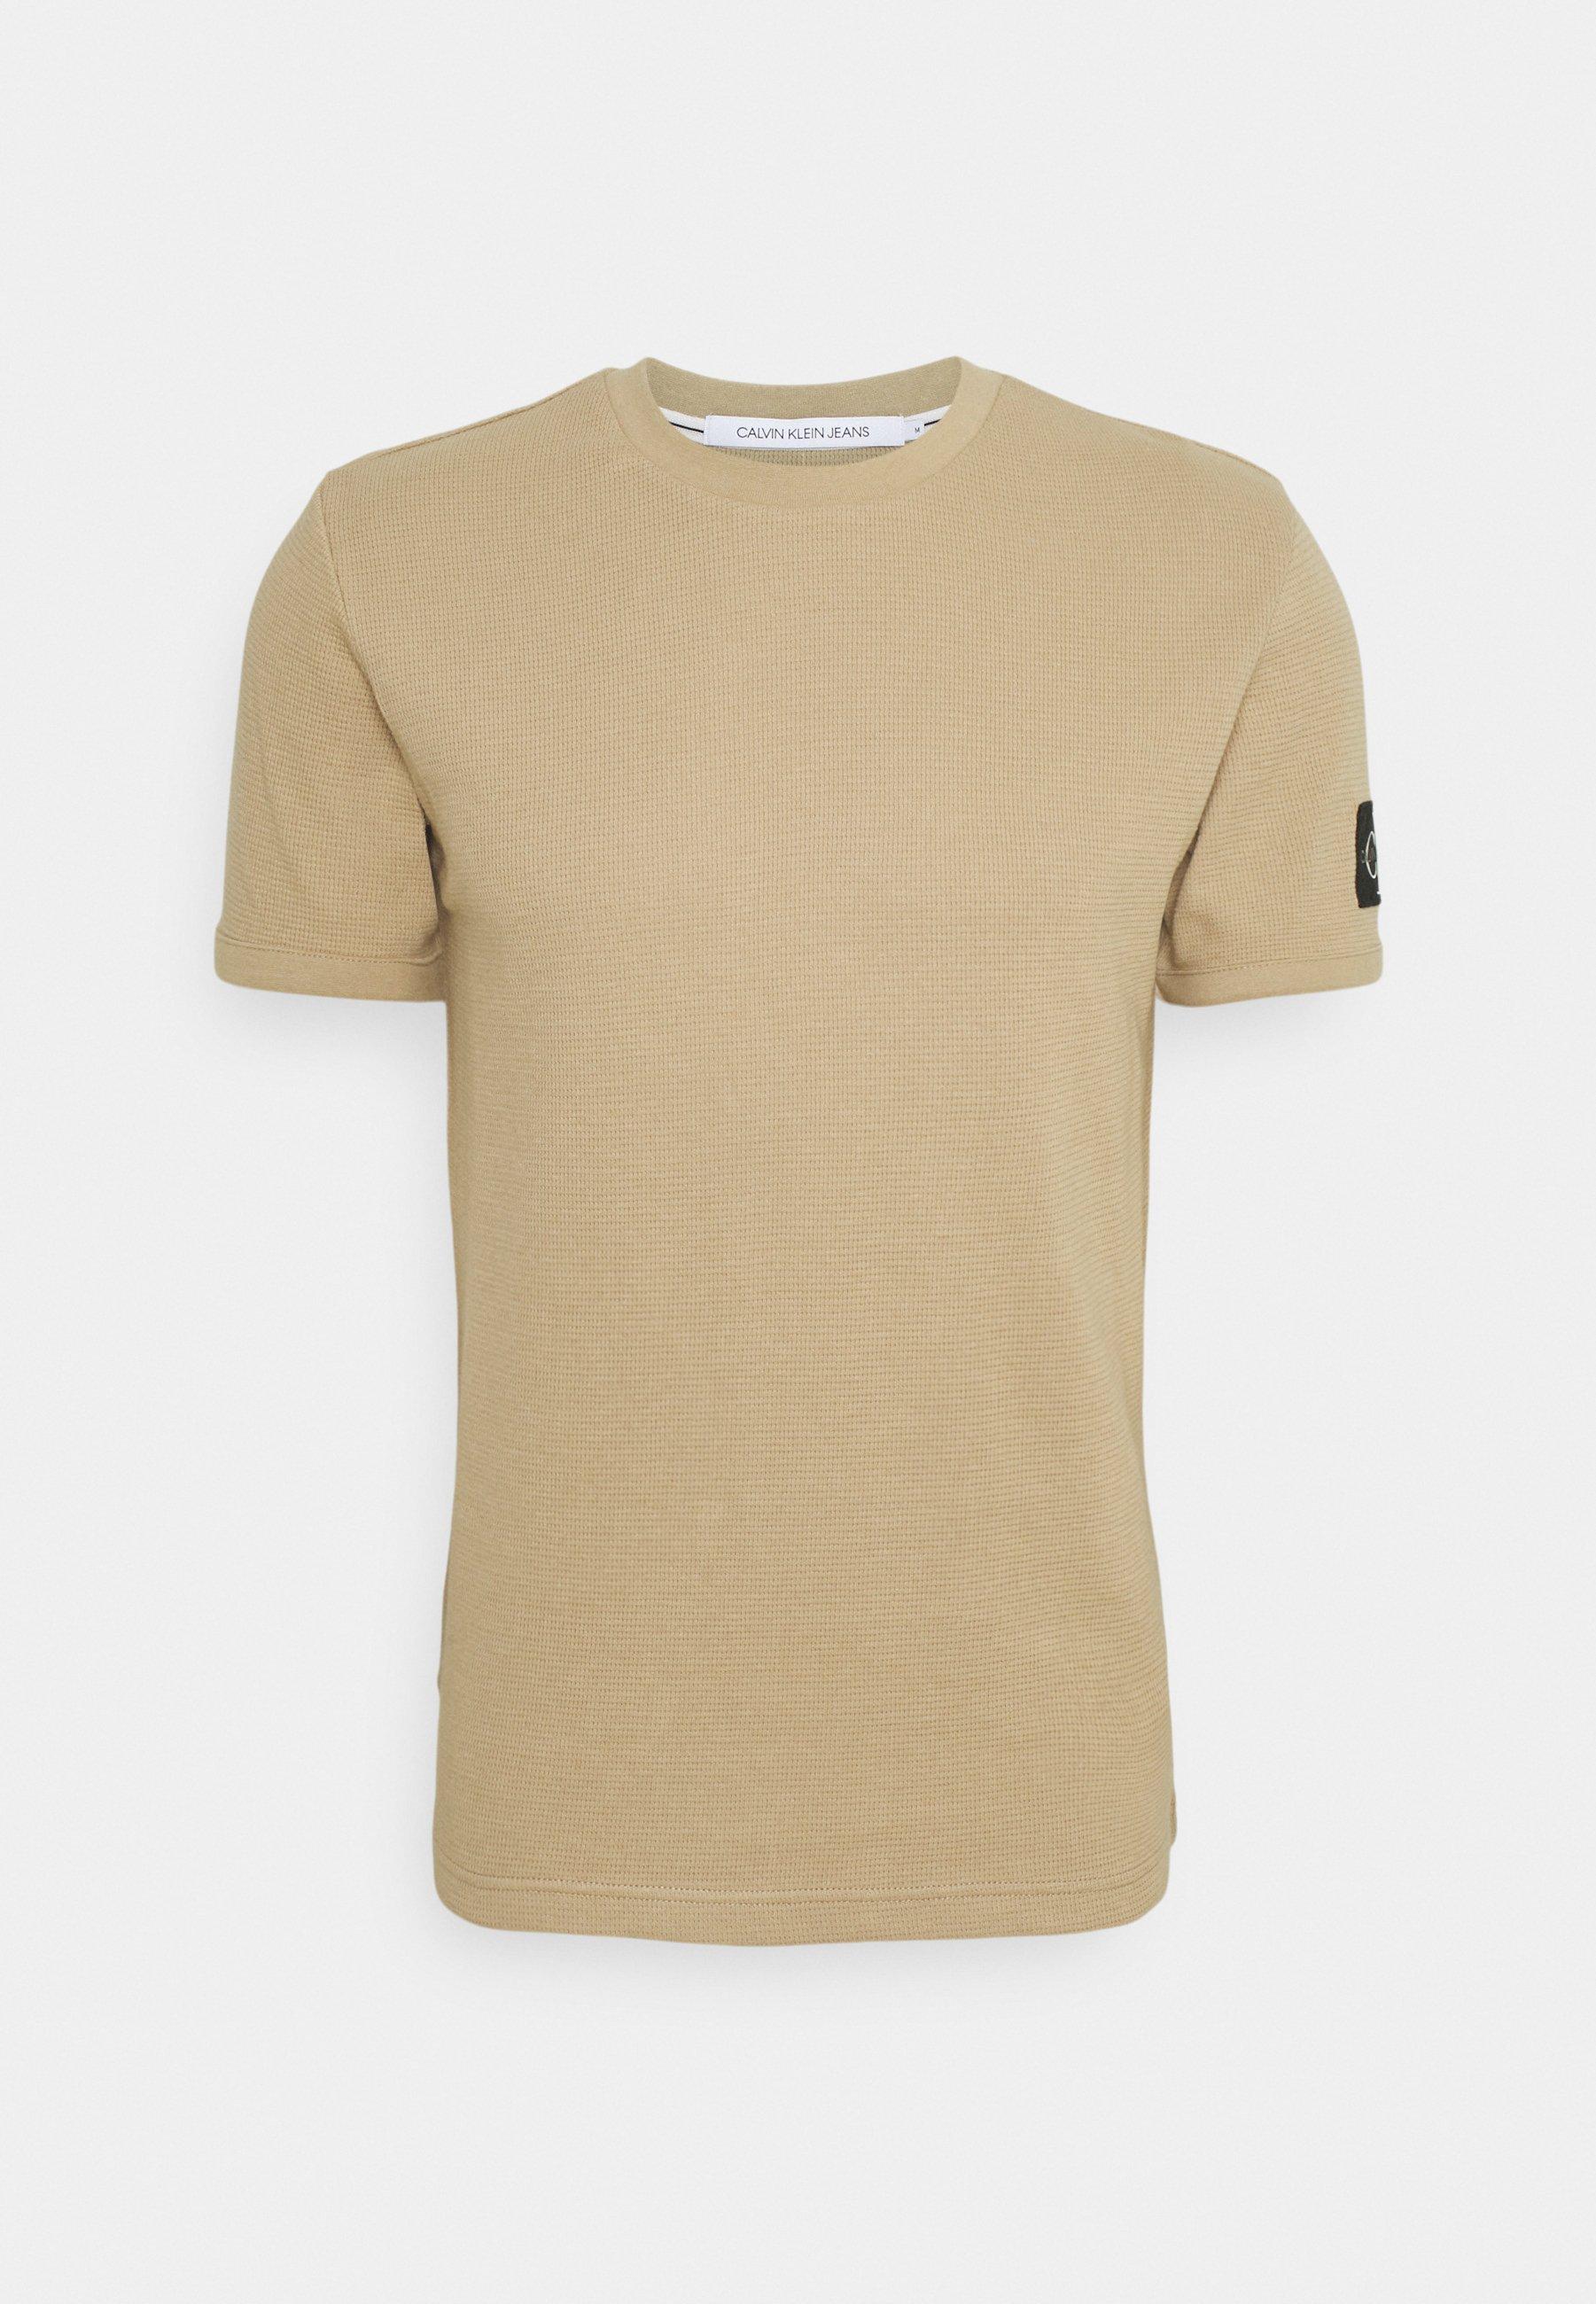 Homme MONOGRAM BADGE WAFFLE TEE - T-shirt imprimé